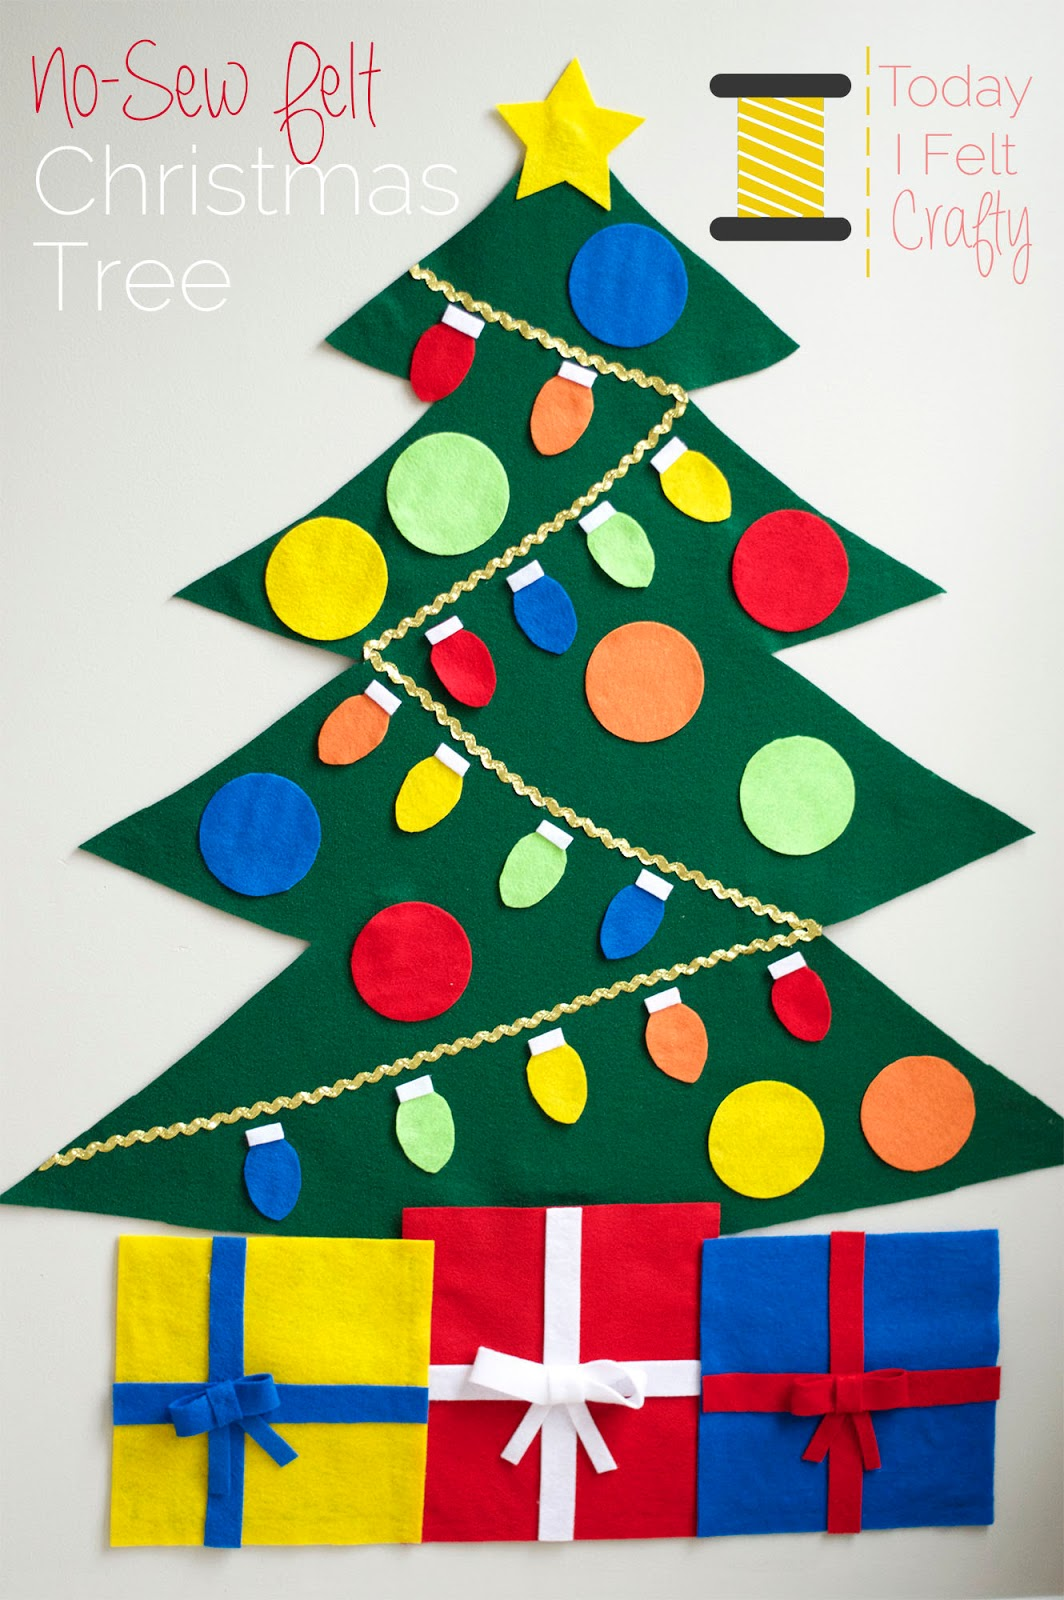 No-Sew Felt Christmas Tree Tutorial